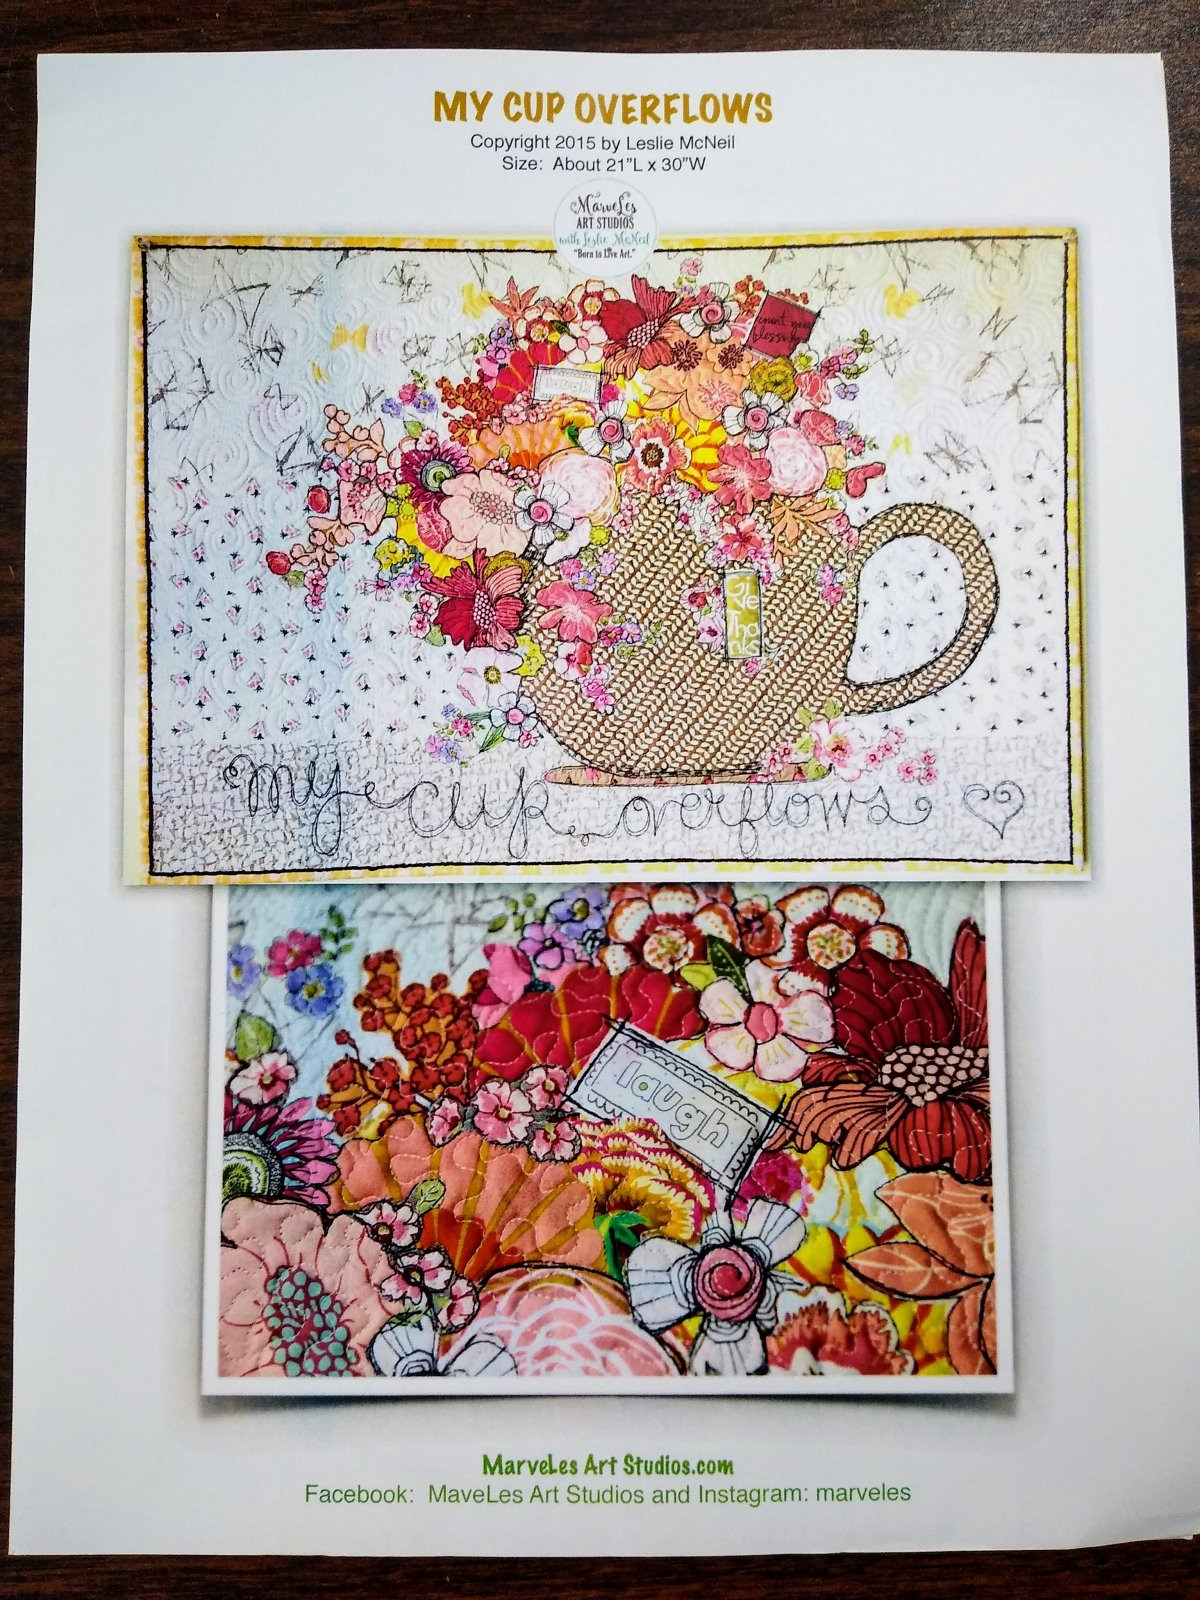 My Cup Overflows - MarveLes Art Studios